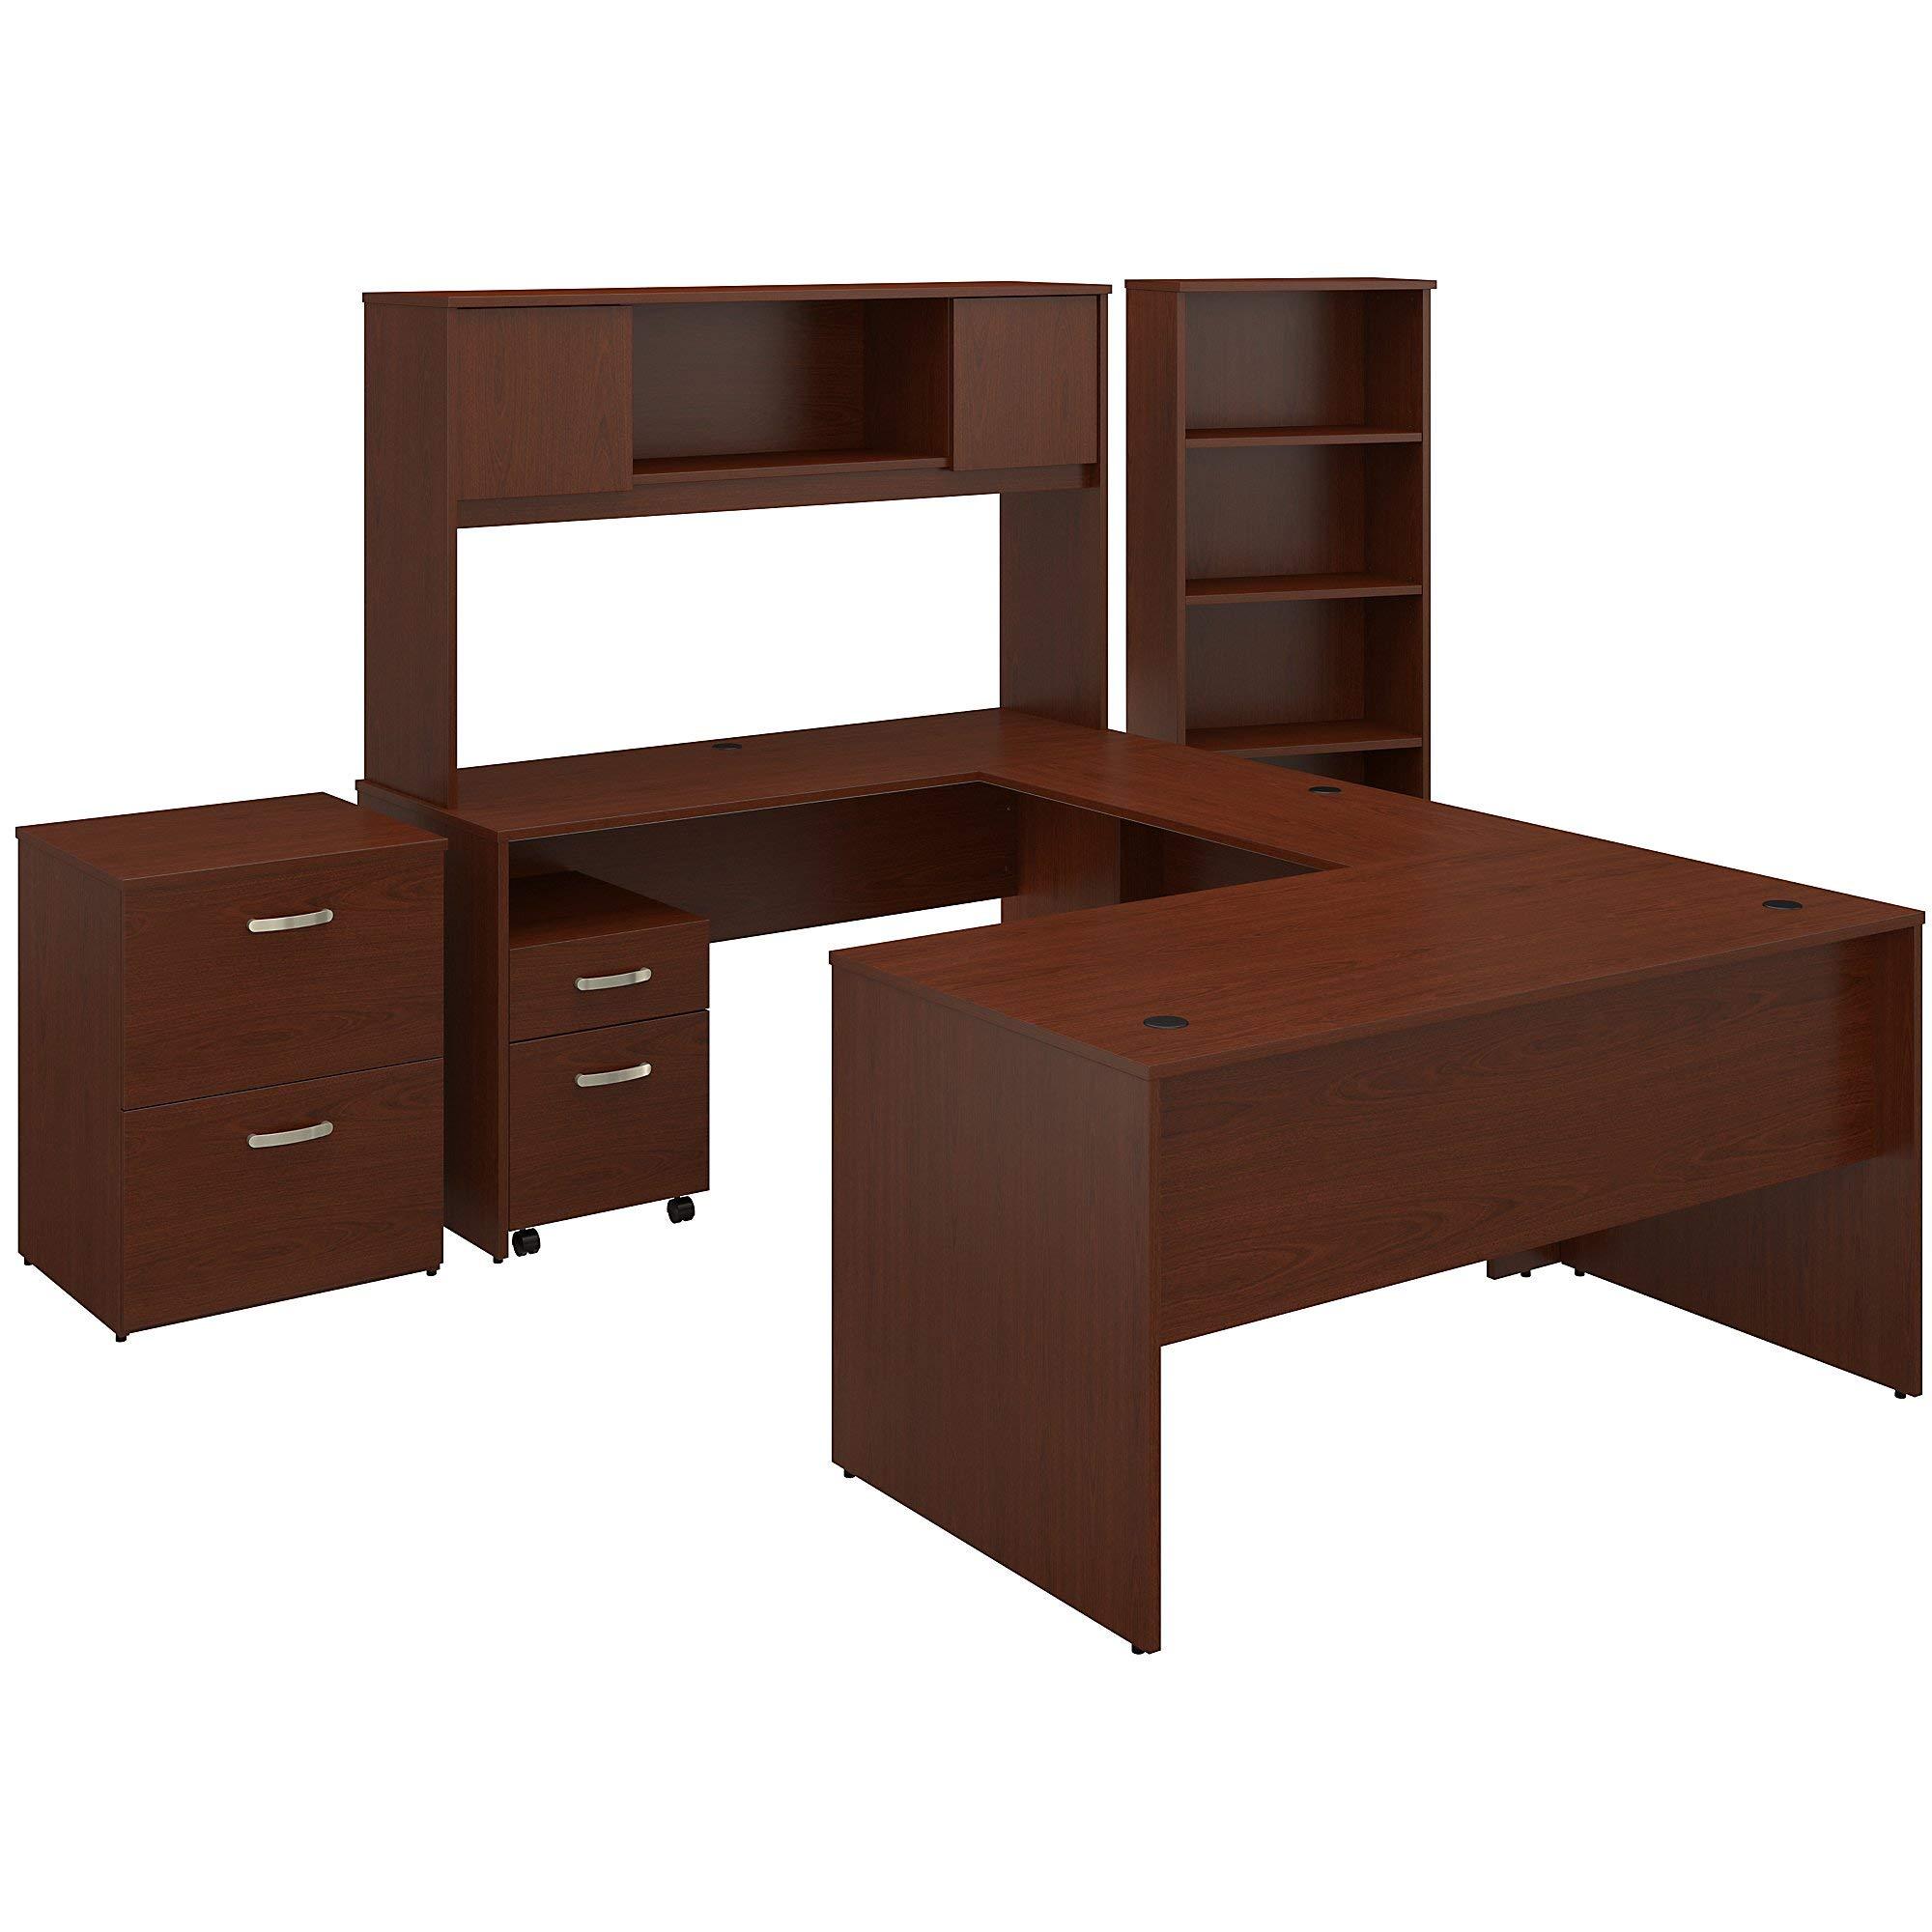 Bush Furniture Commerce 60W U Shaped Desk with Hutch, File Cabinets and Bookcase in Autumn Cherry by Bush Furniture